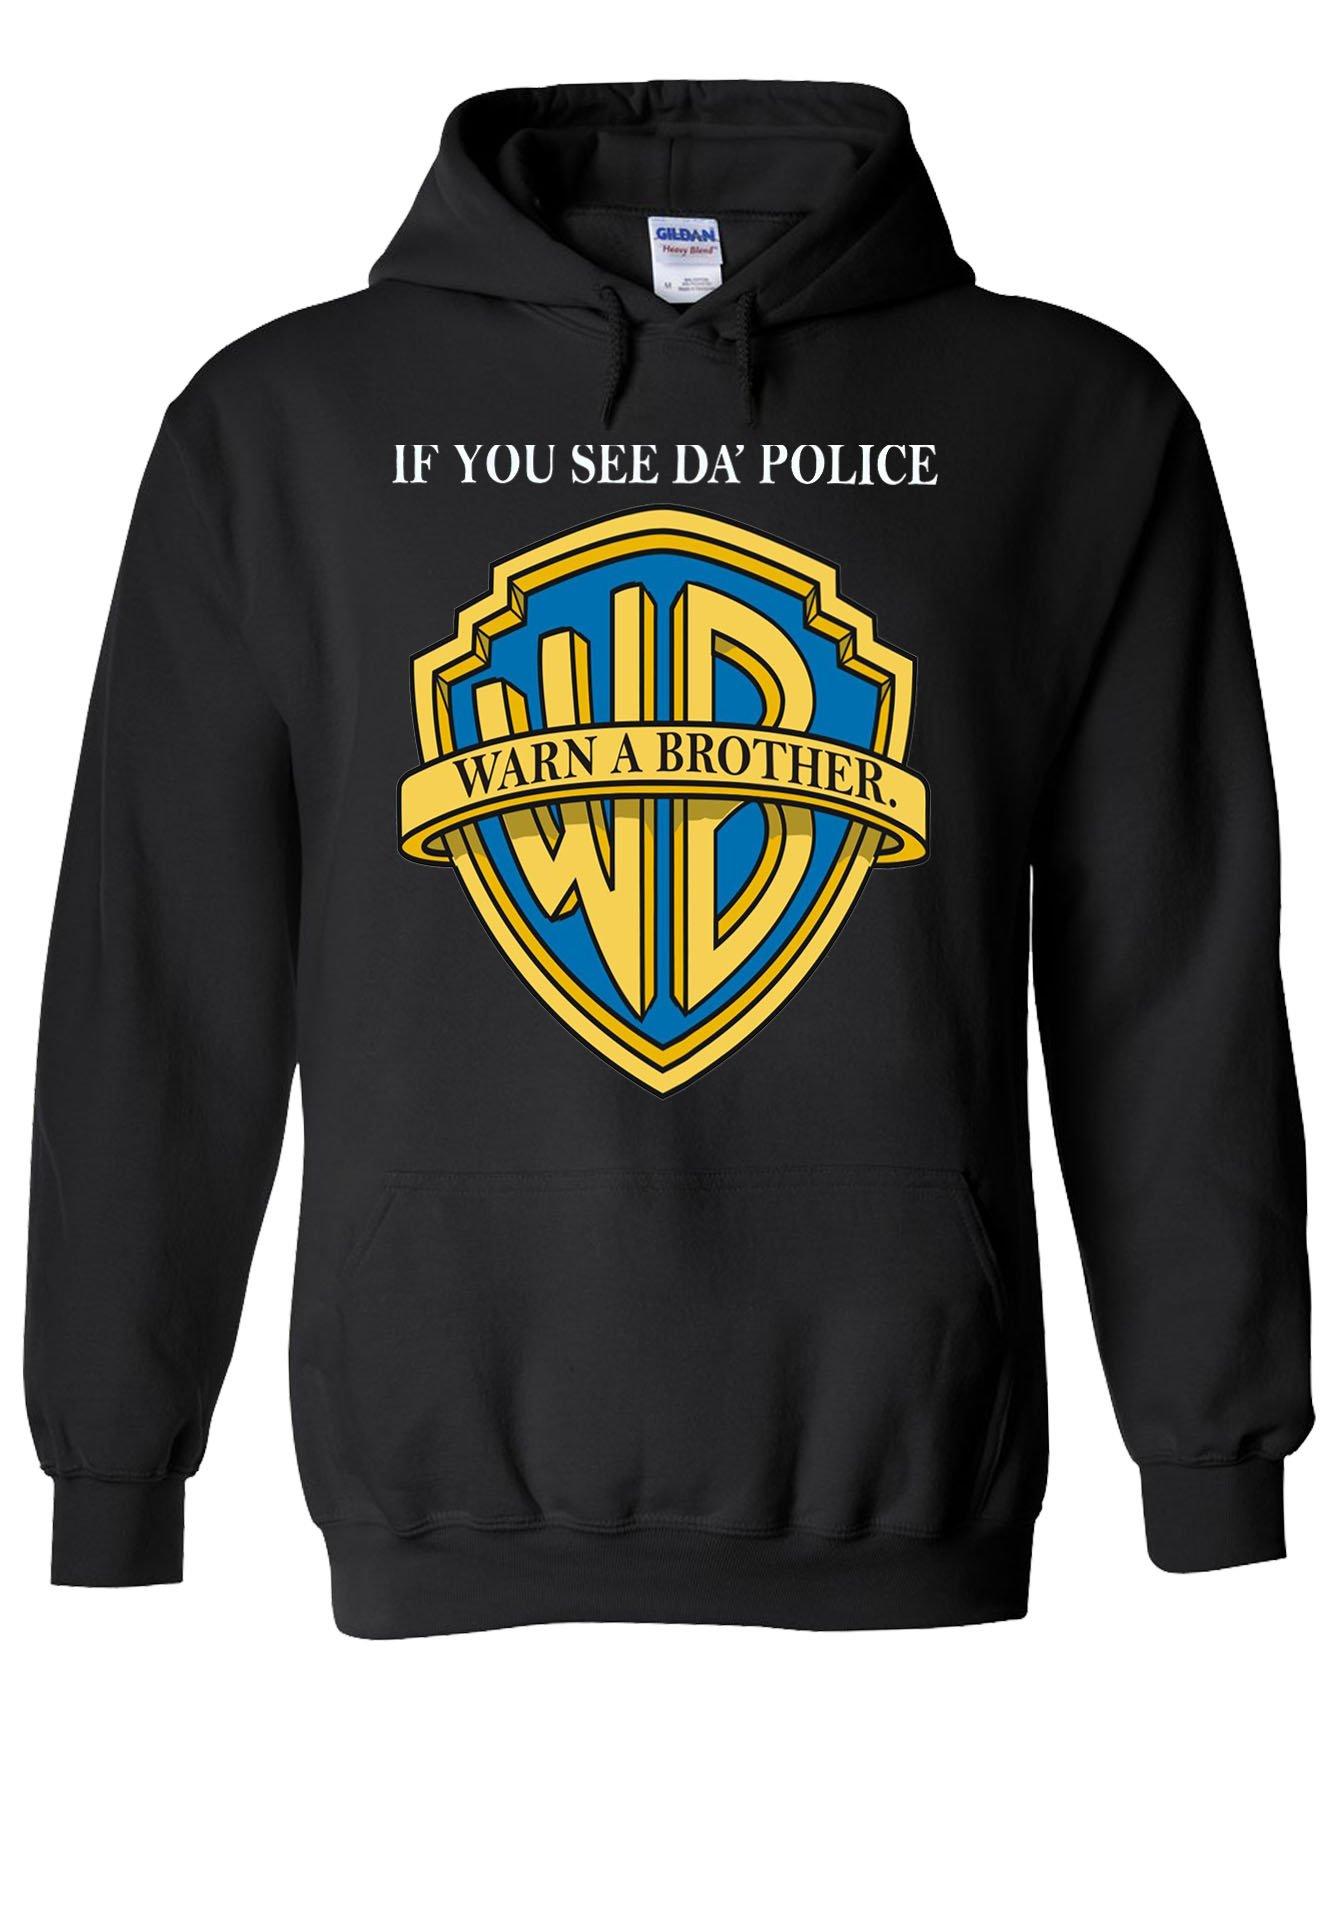 If You See Da Police Warn A Brother Novelty Black Unisex Hooded Hoodi Shirts